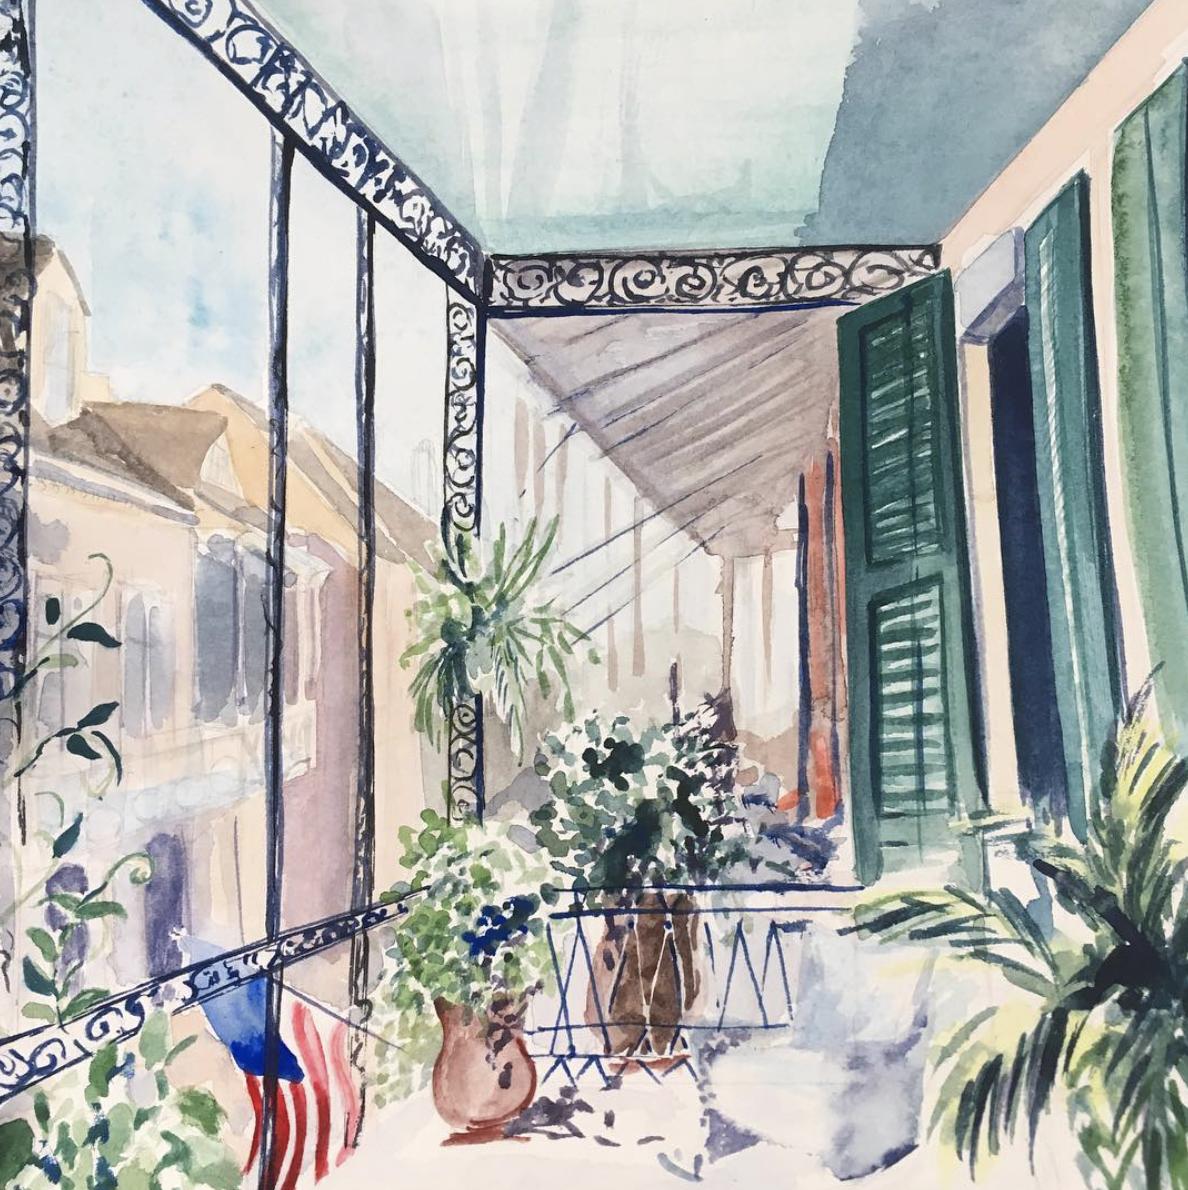 Lydia-marie-elizabeth-concept-sketch-in-watercolor-of-new-orleans-front-porch-american-road-trip-desk-calendar